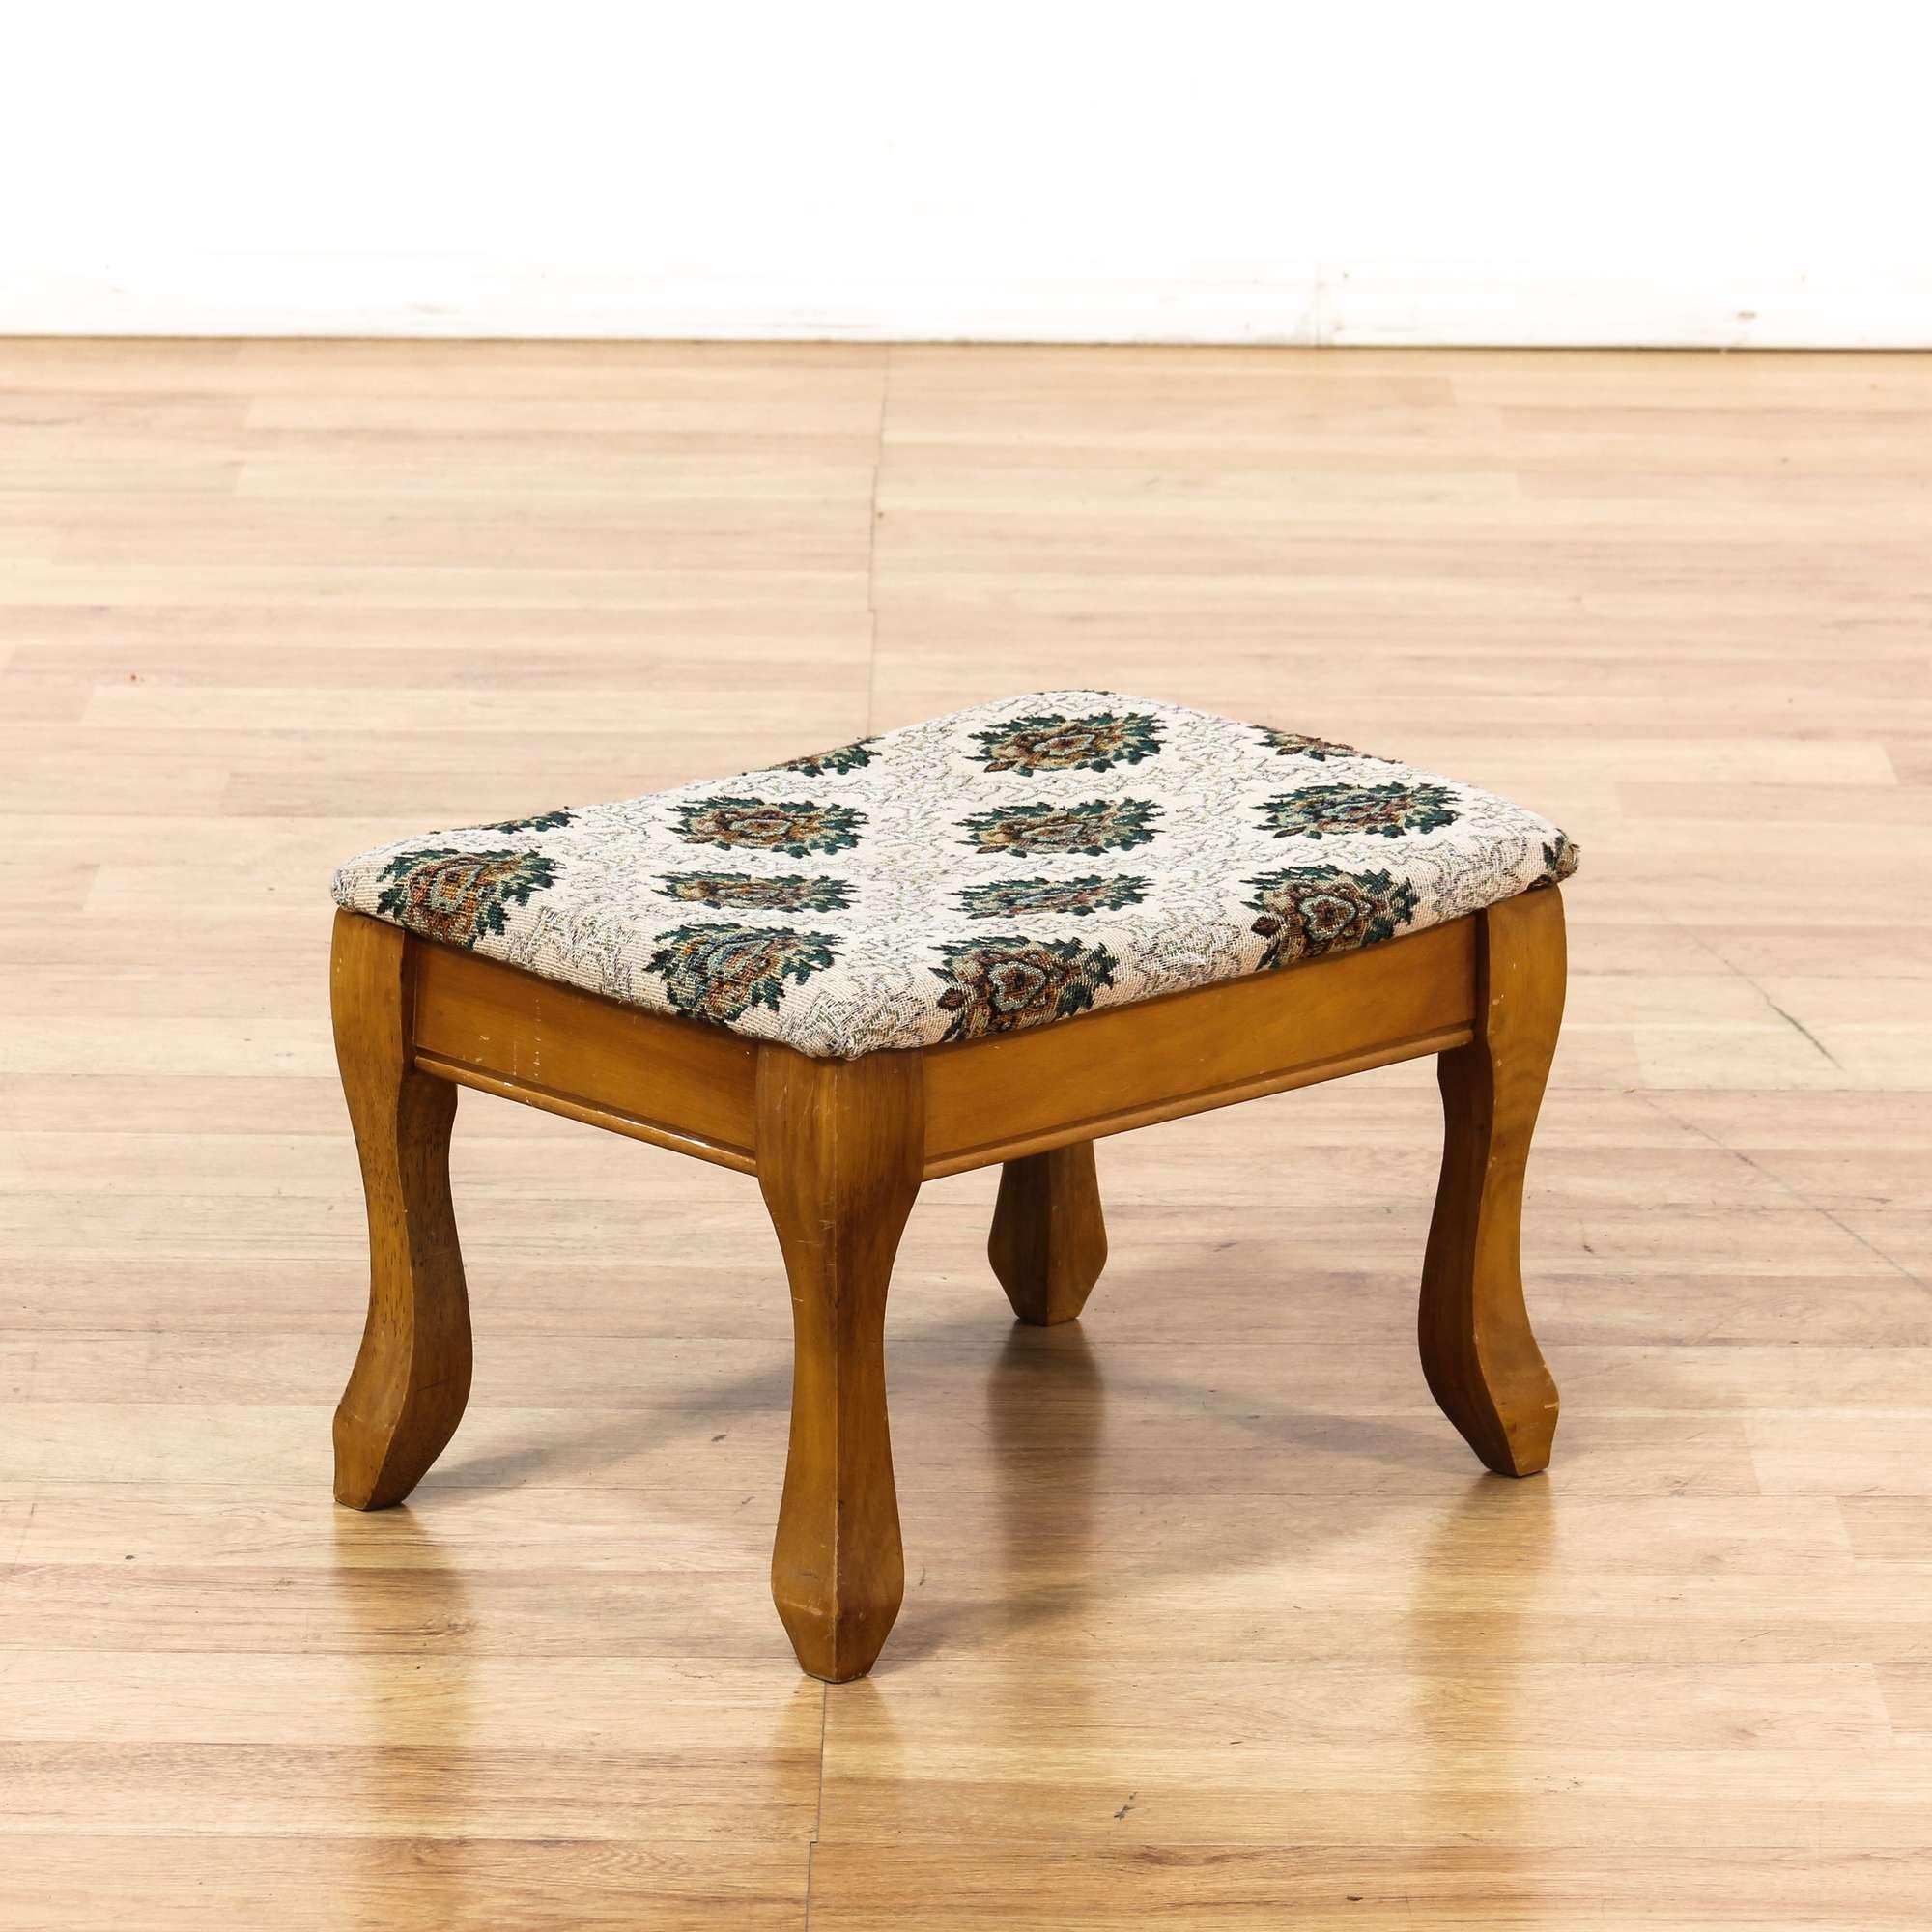 Foot Stool W Floral Upholstery Loveseat Vintage Furniture San Diego Los Angeles